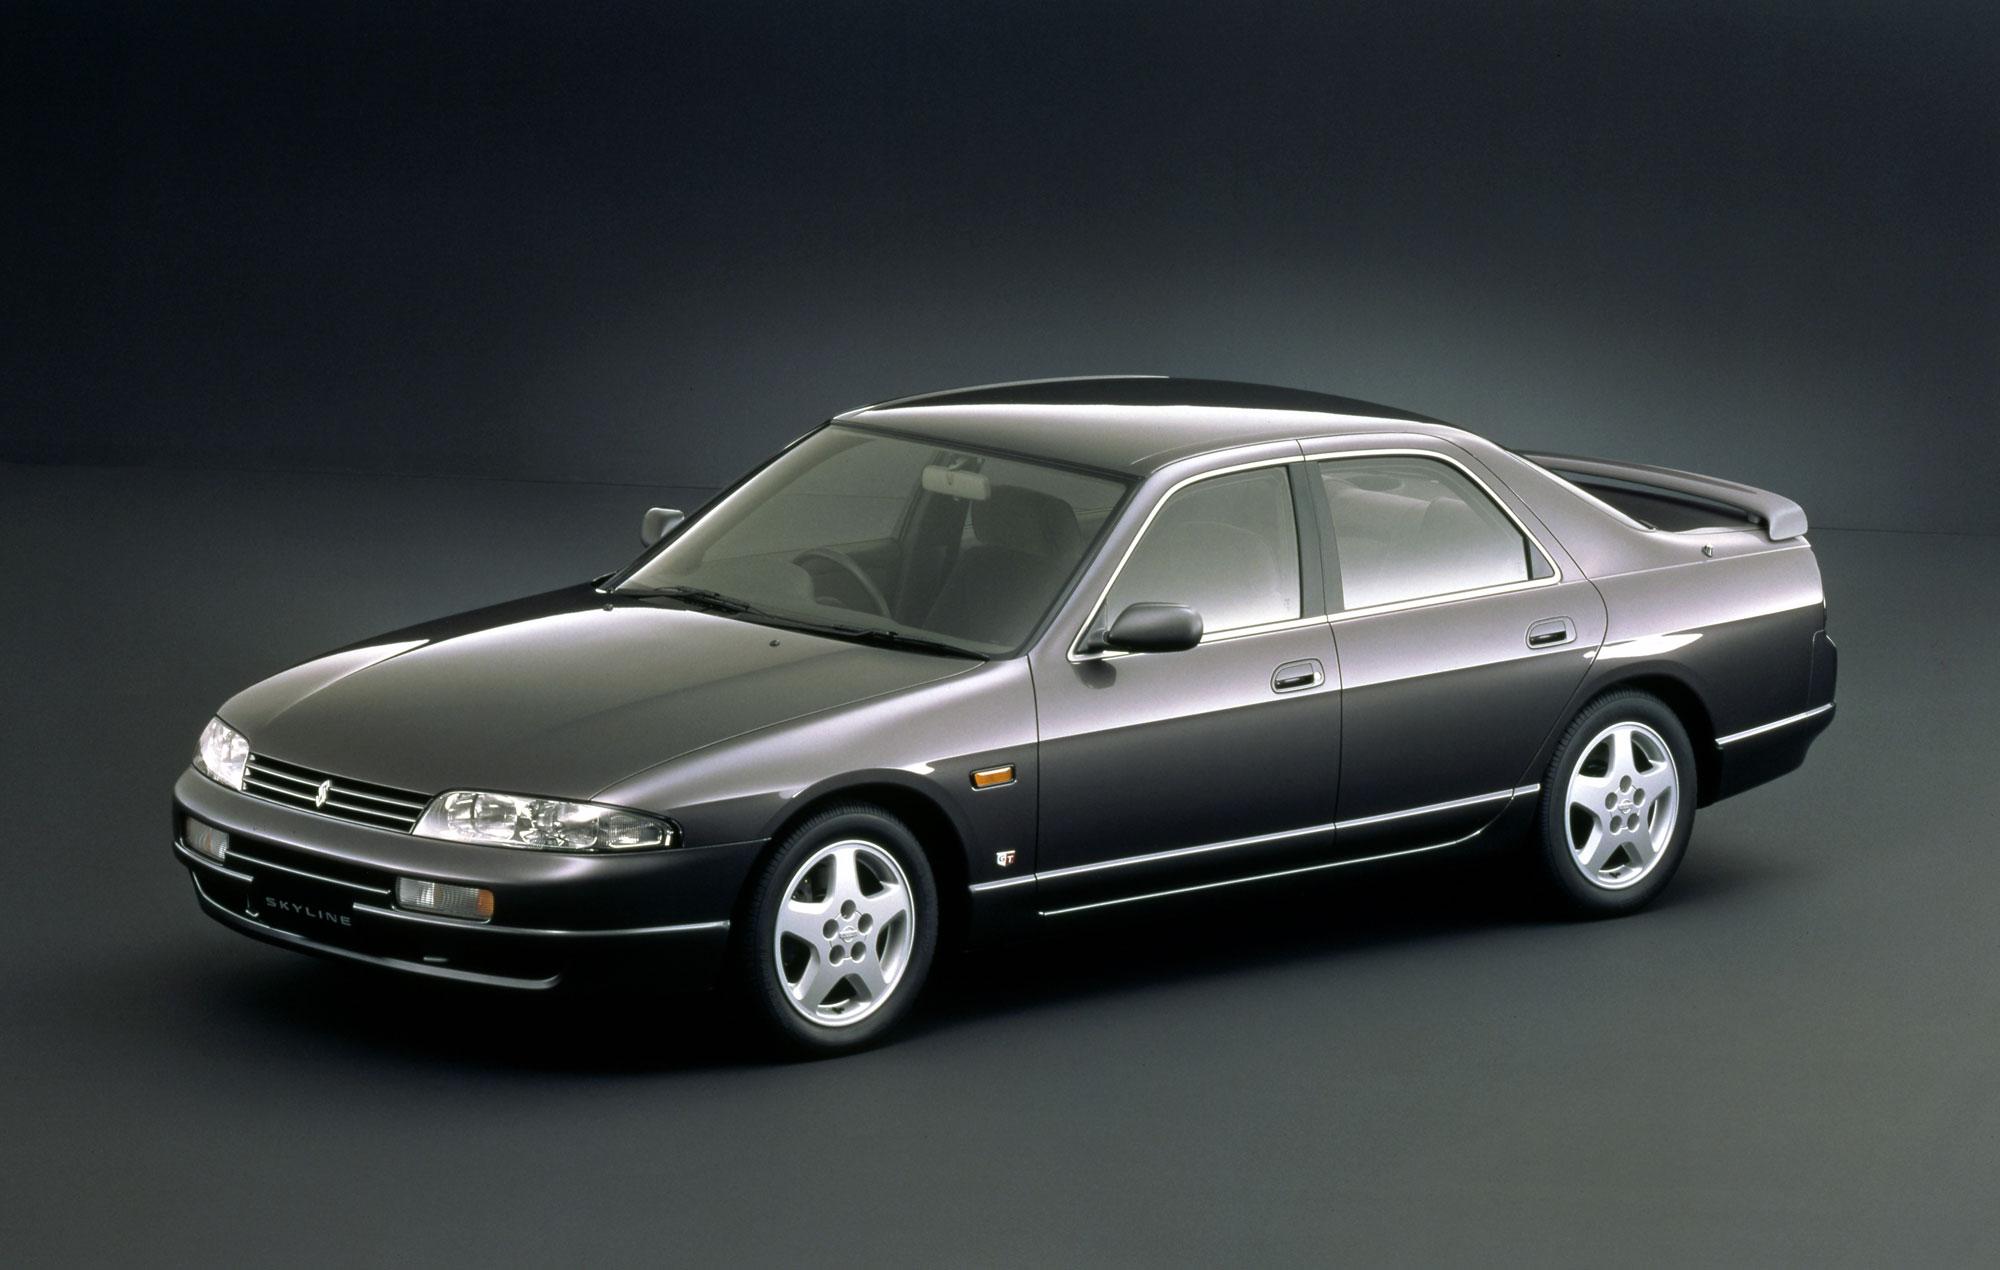 Nissan Skyline GTS25 - Photos, News, Reviews, Specs, Car ...